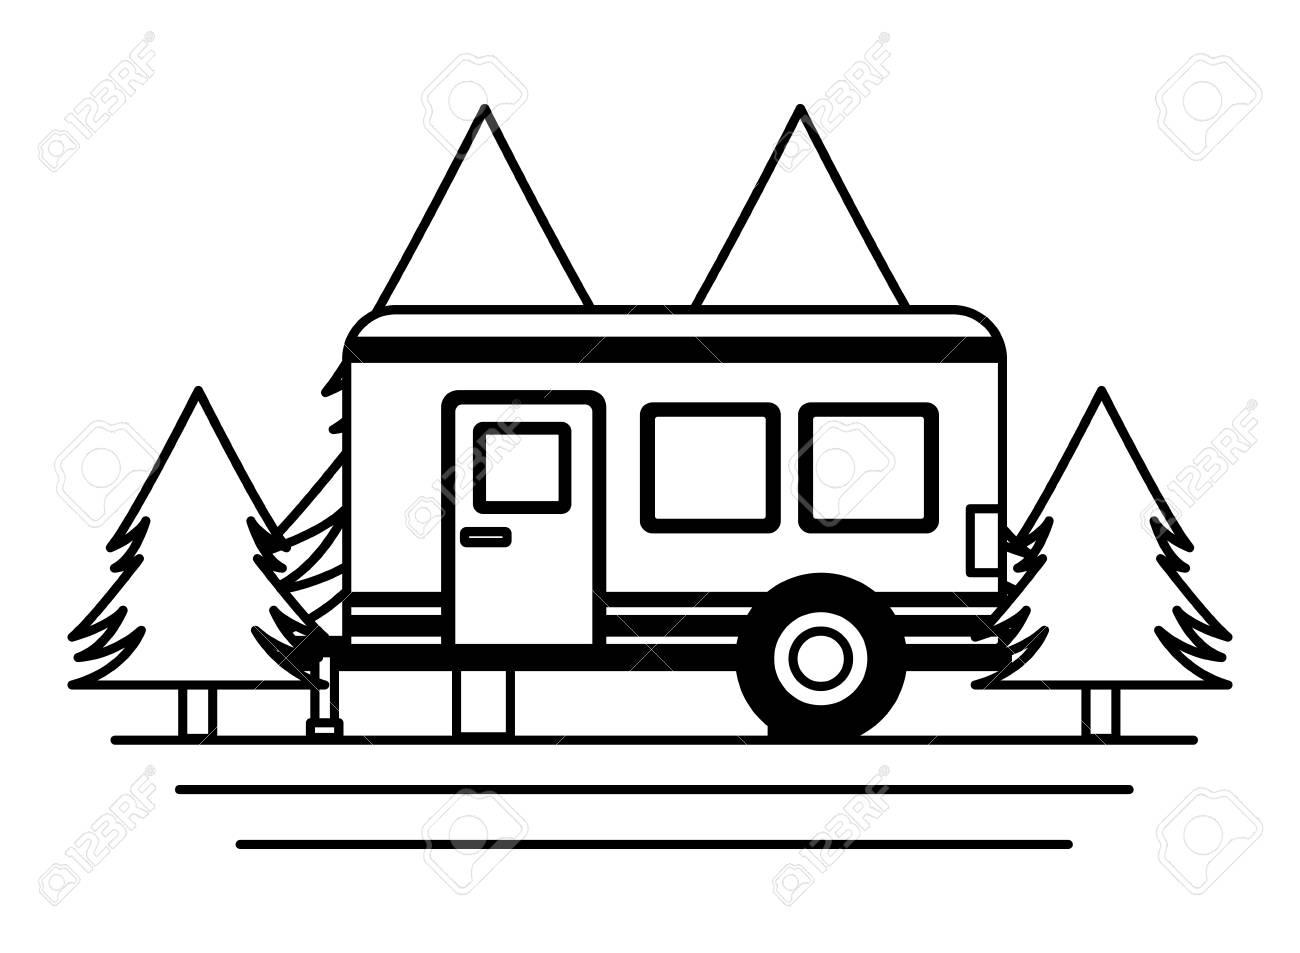 camper trailer trees pine scene vector illustration - 116853072